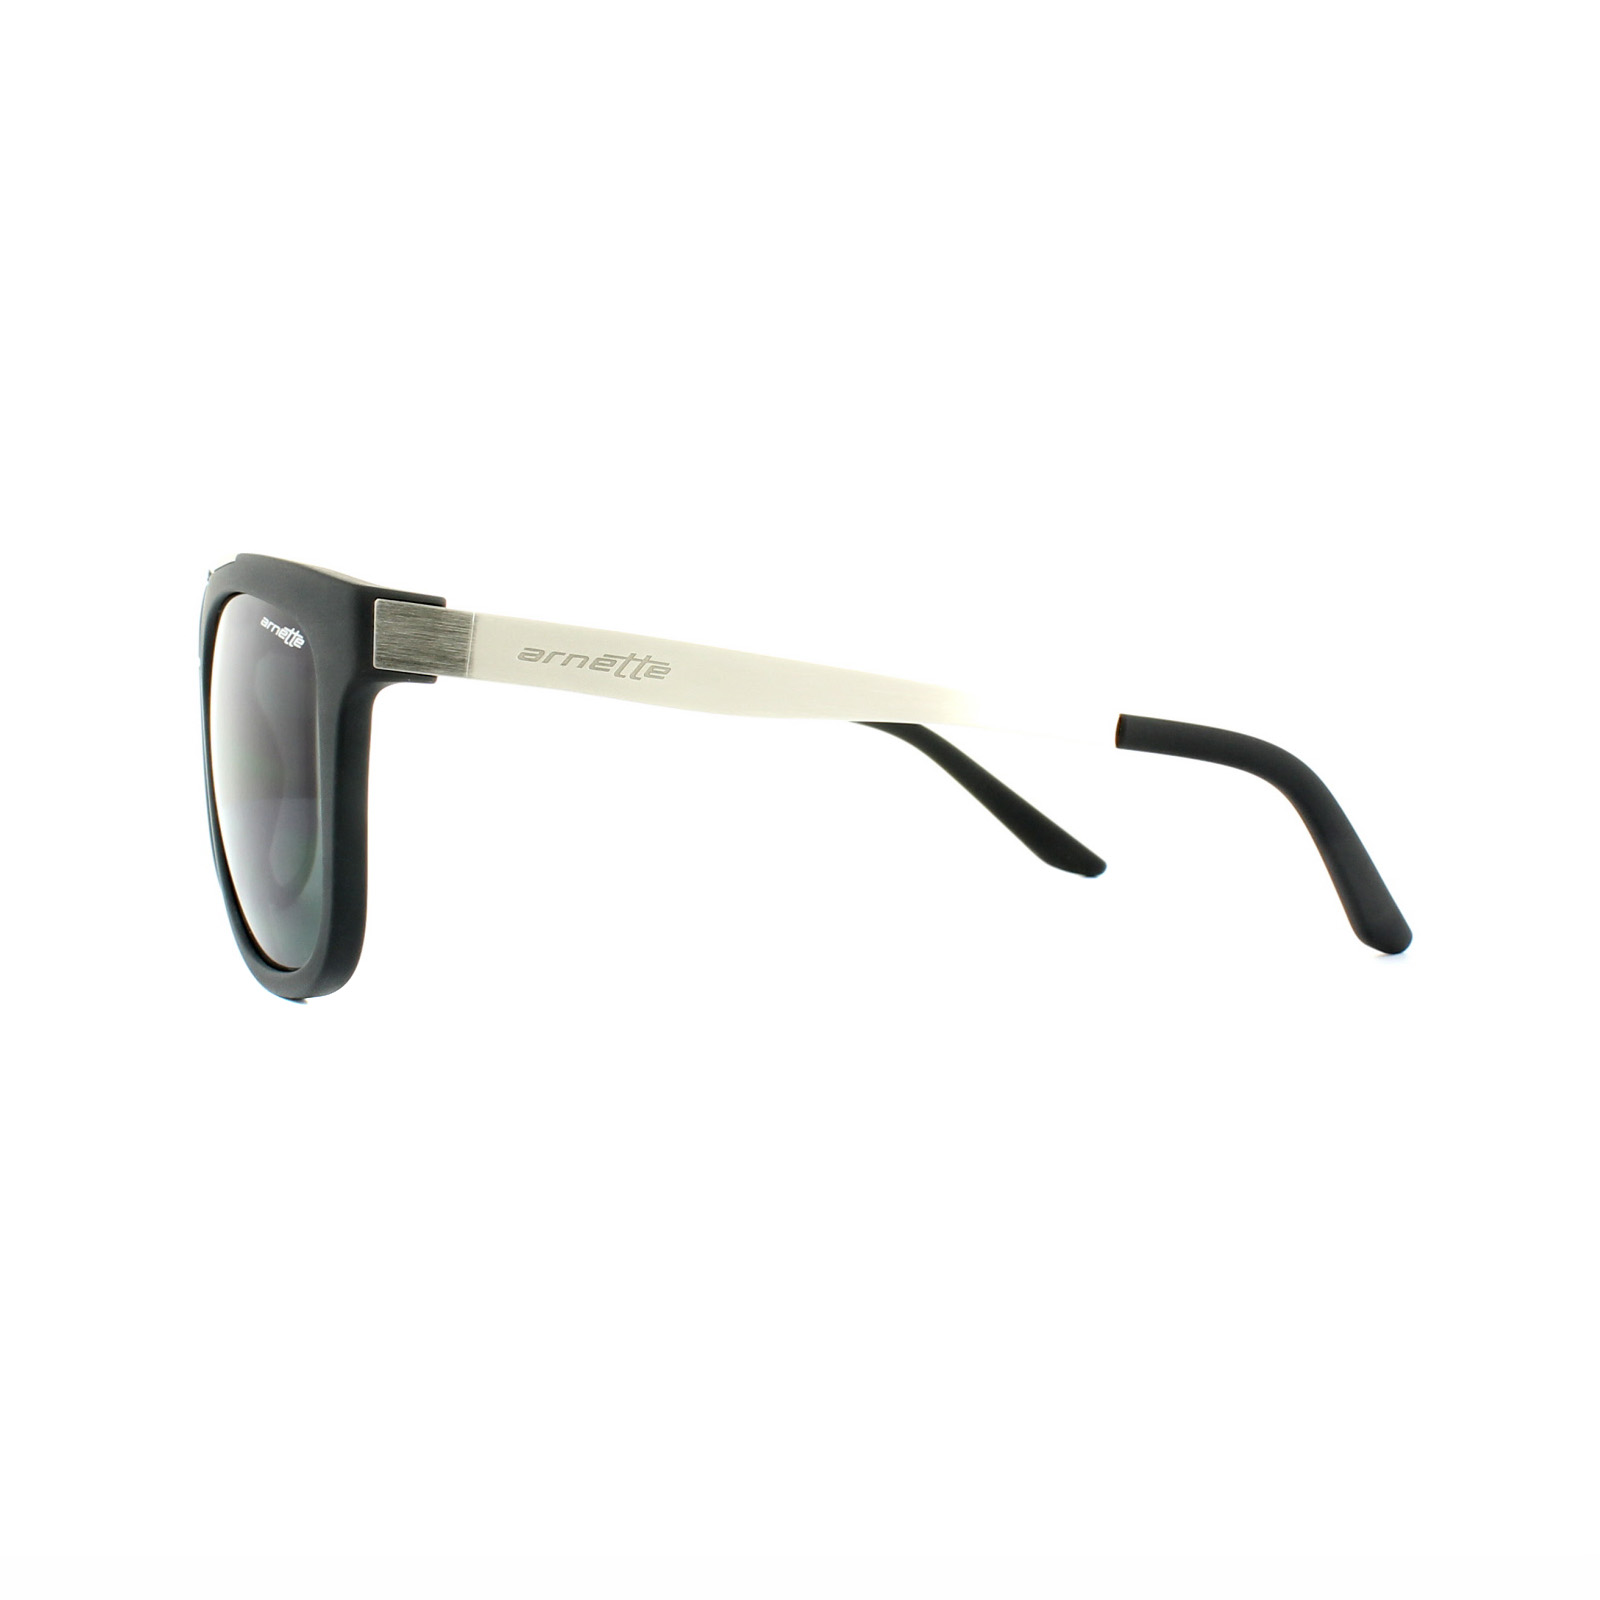 De Gafas Mate Título Negro Detalles Cepillada 0187 Original Ver Sol Coyuntura Arnette Gris Plata 4232 E2H9DYeWIb